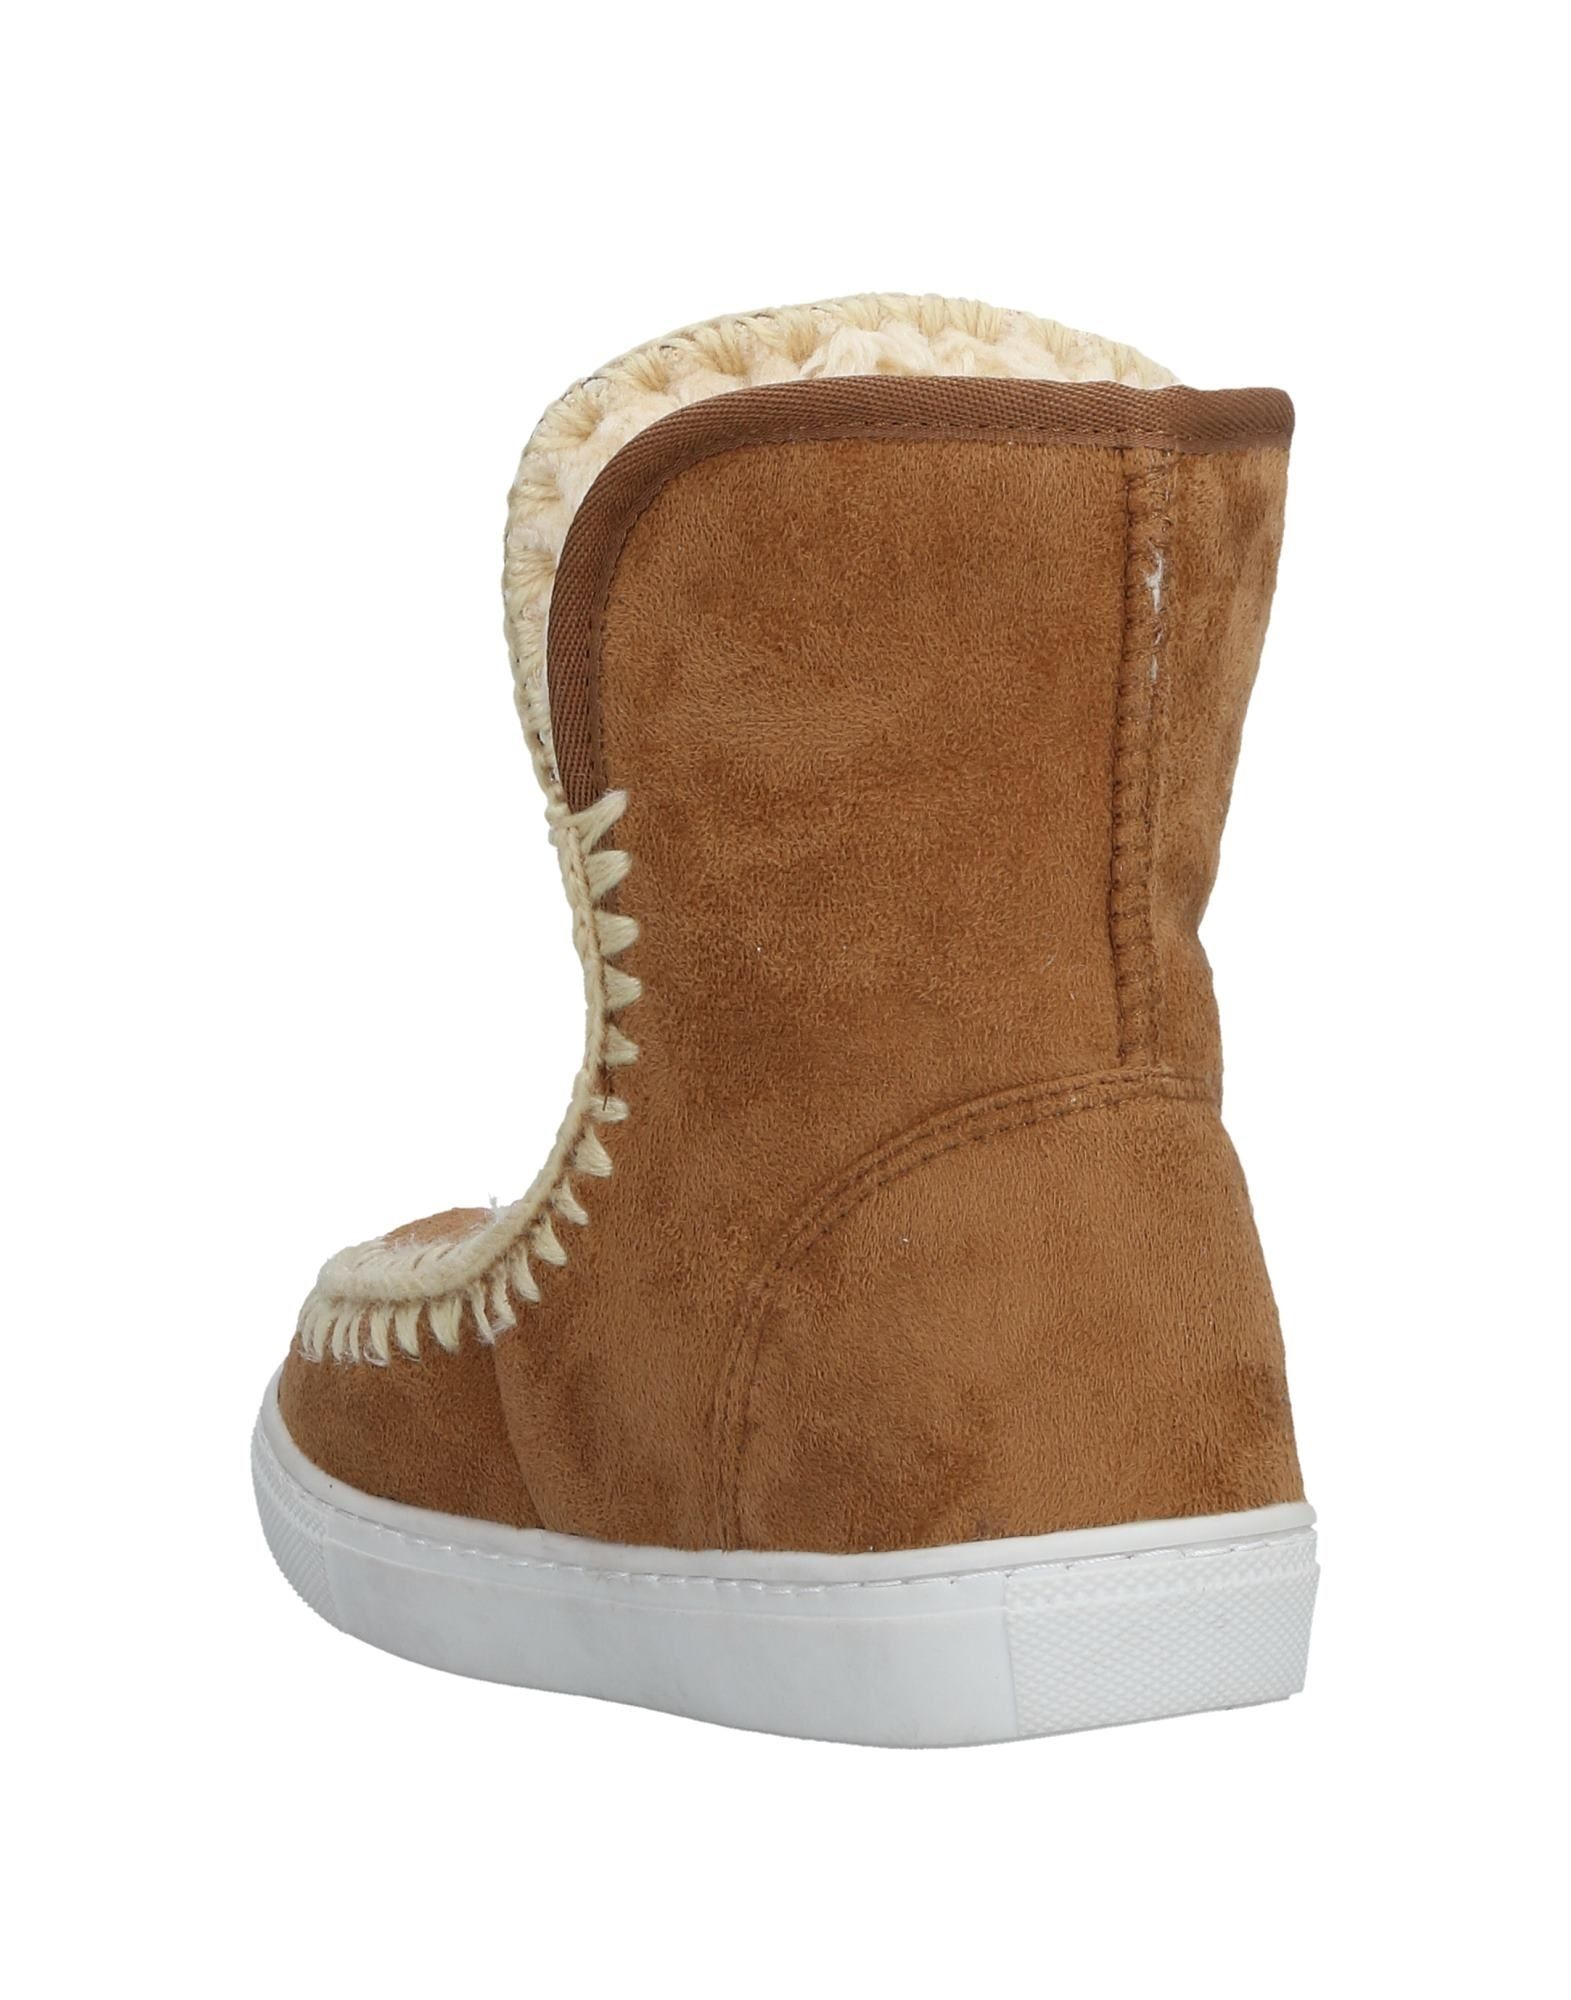 Roberto Della Gute Croce Stiefelette Damen  11531251KN Gute Della Qualität beliebte Schuhe 285134